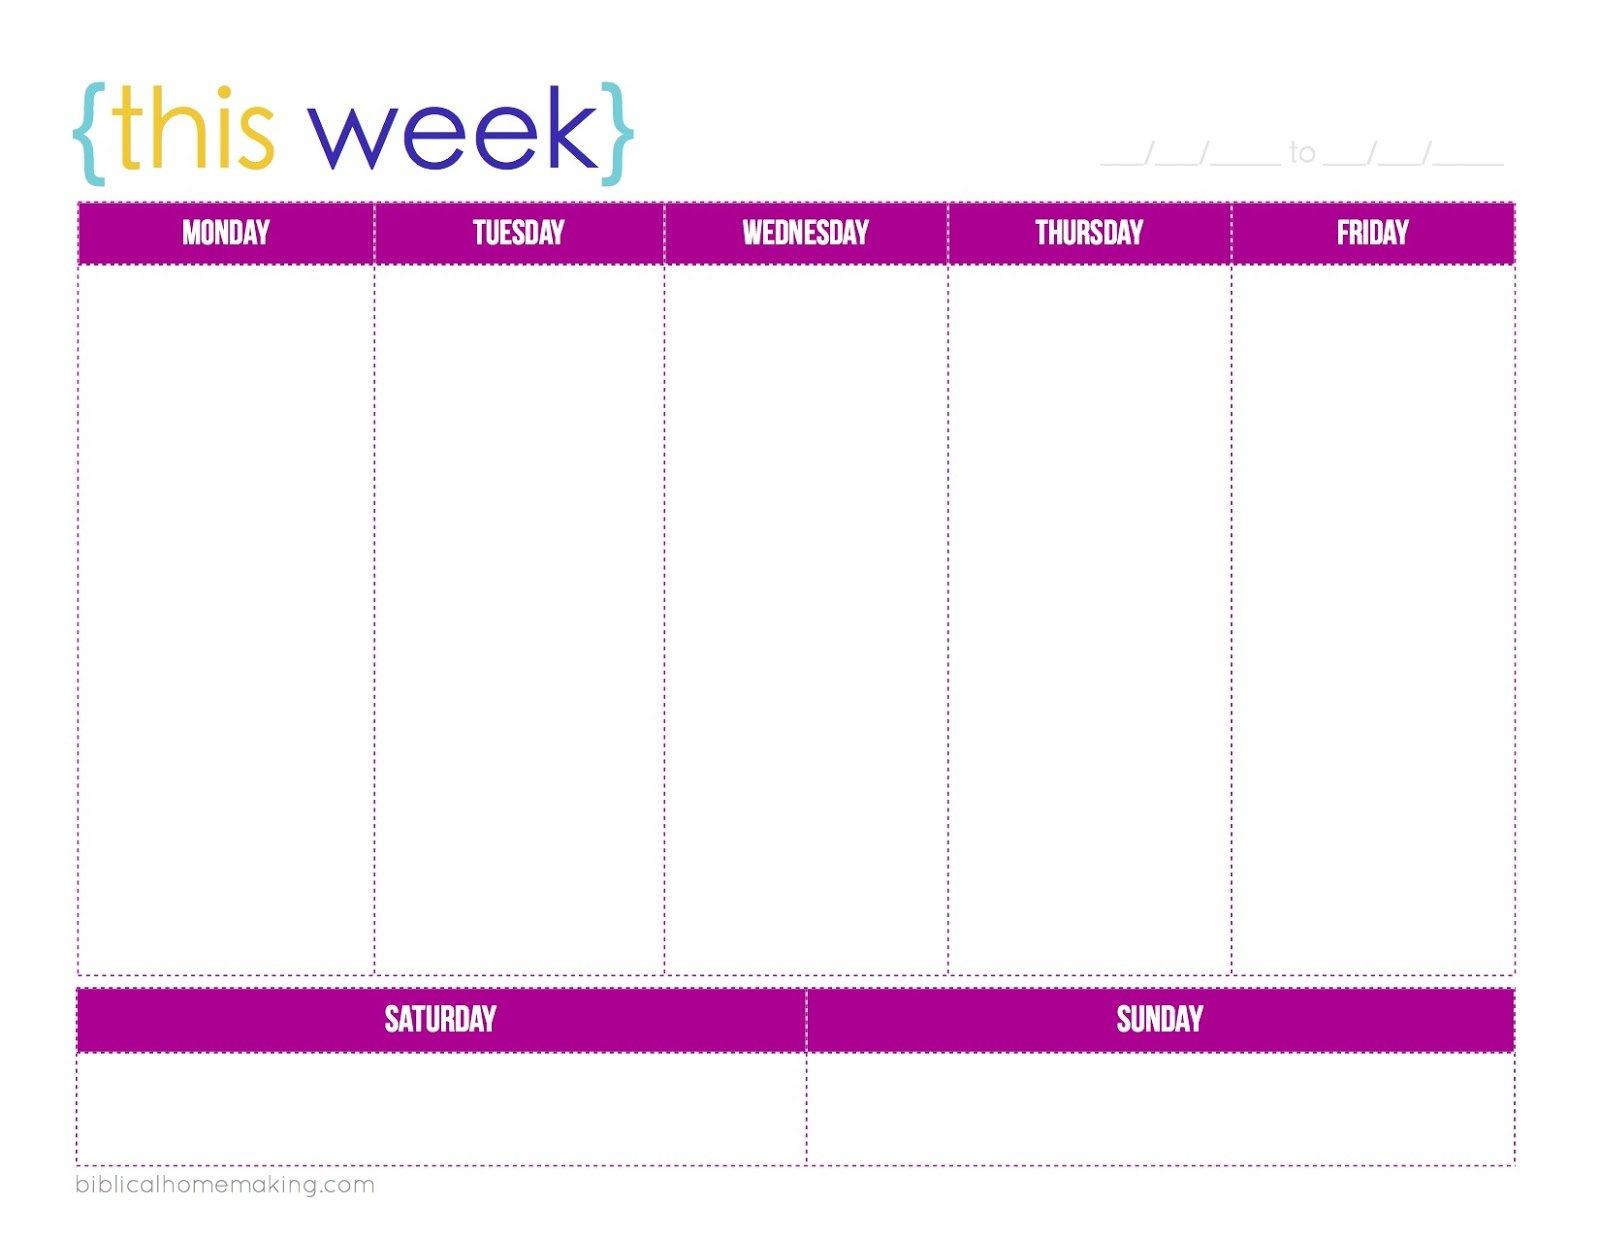 One Week Monday Through Friday Calendar Template | Example Monday To Friday Calender Template